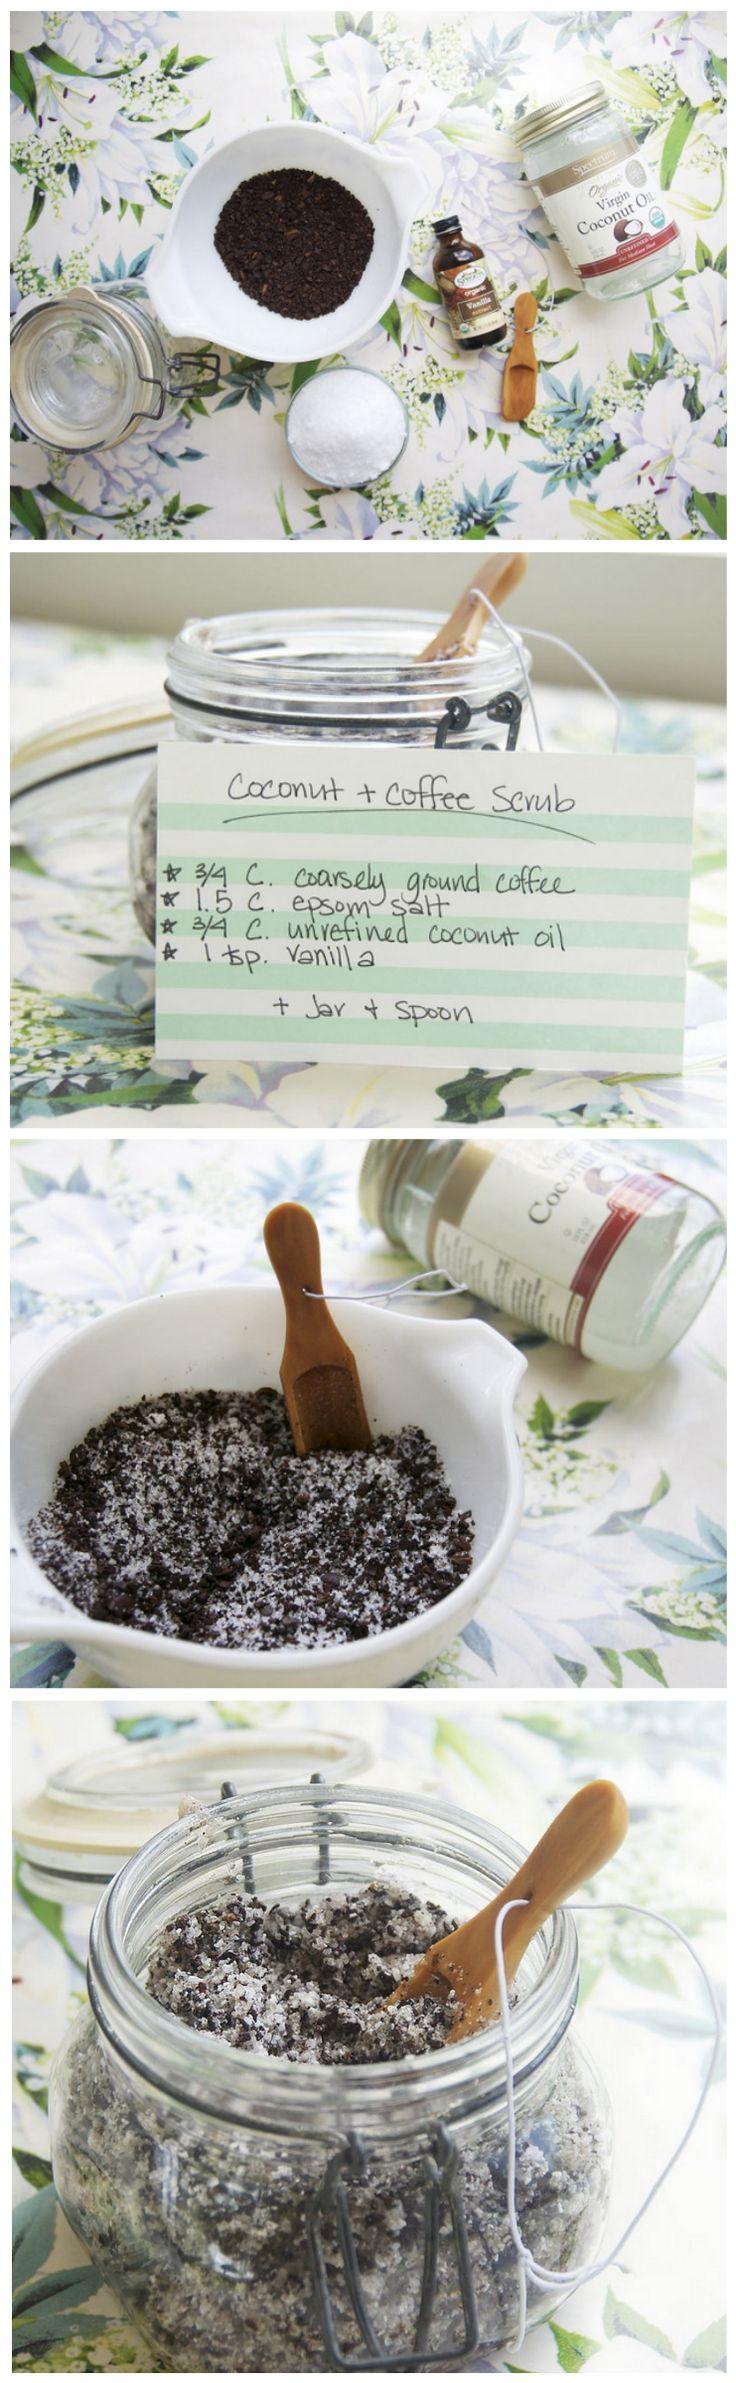 Wake Up With This Coconut + Coffee Body Scrub Diy